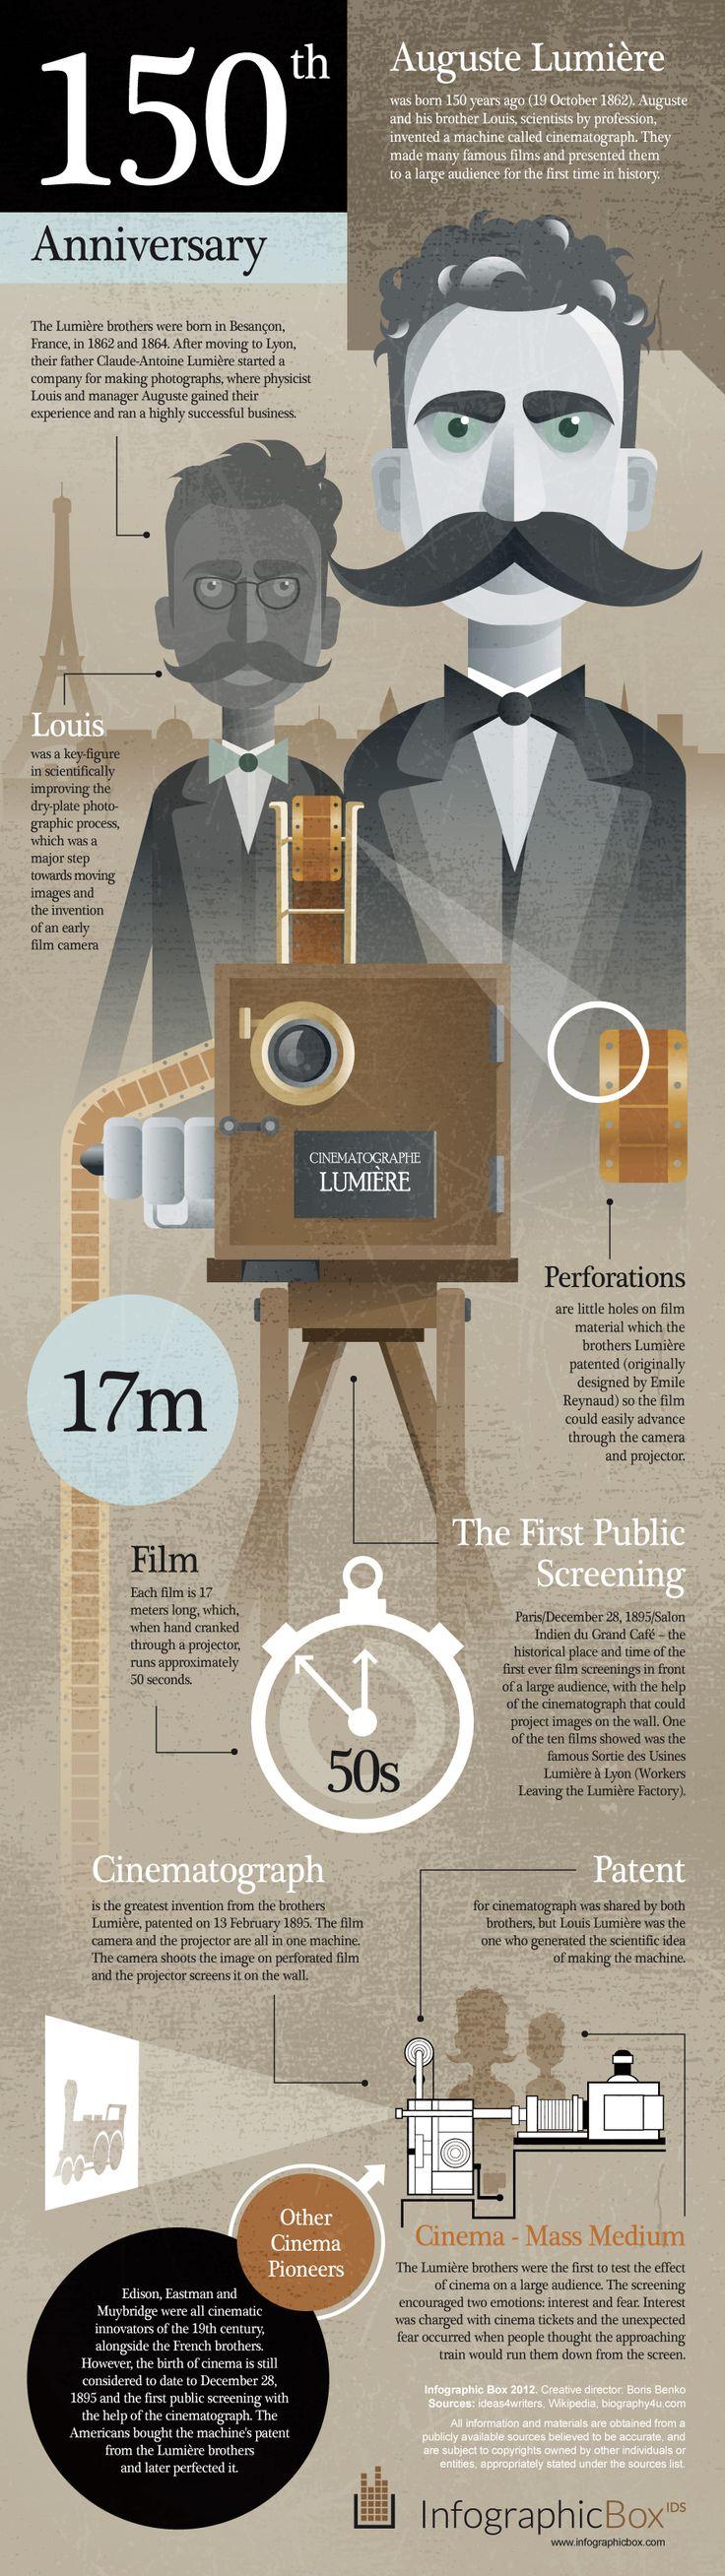 Auguste Lumière: 150th Birthday